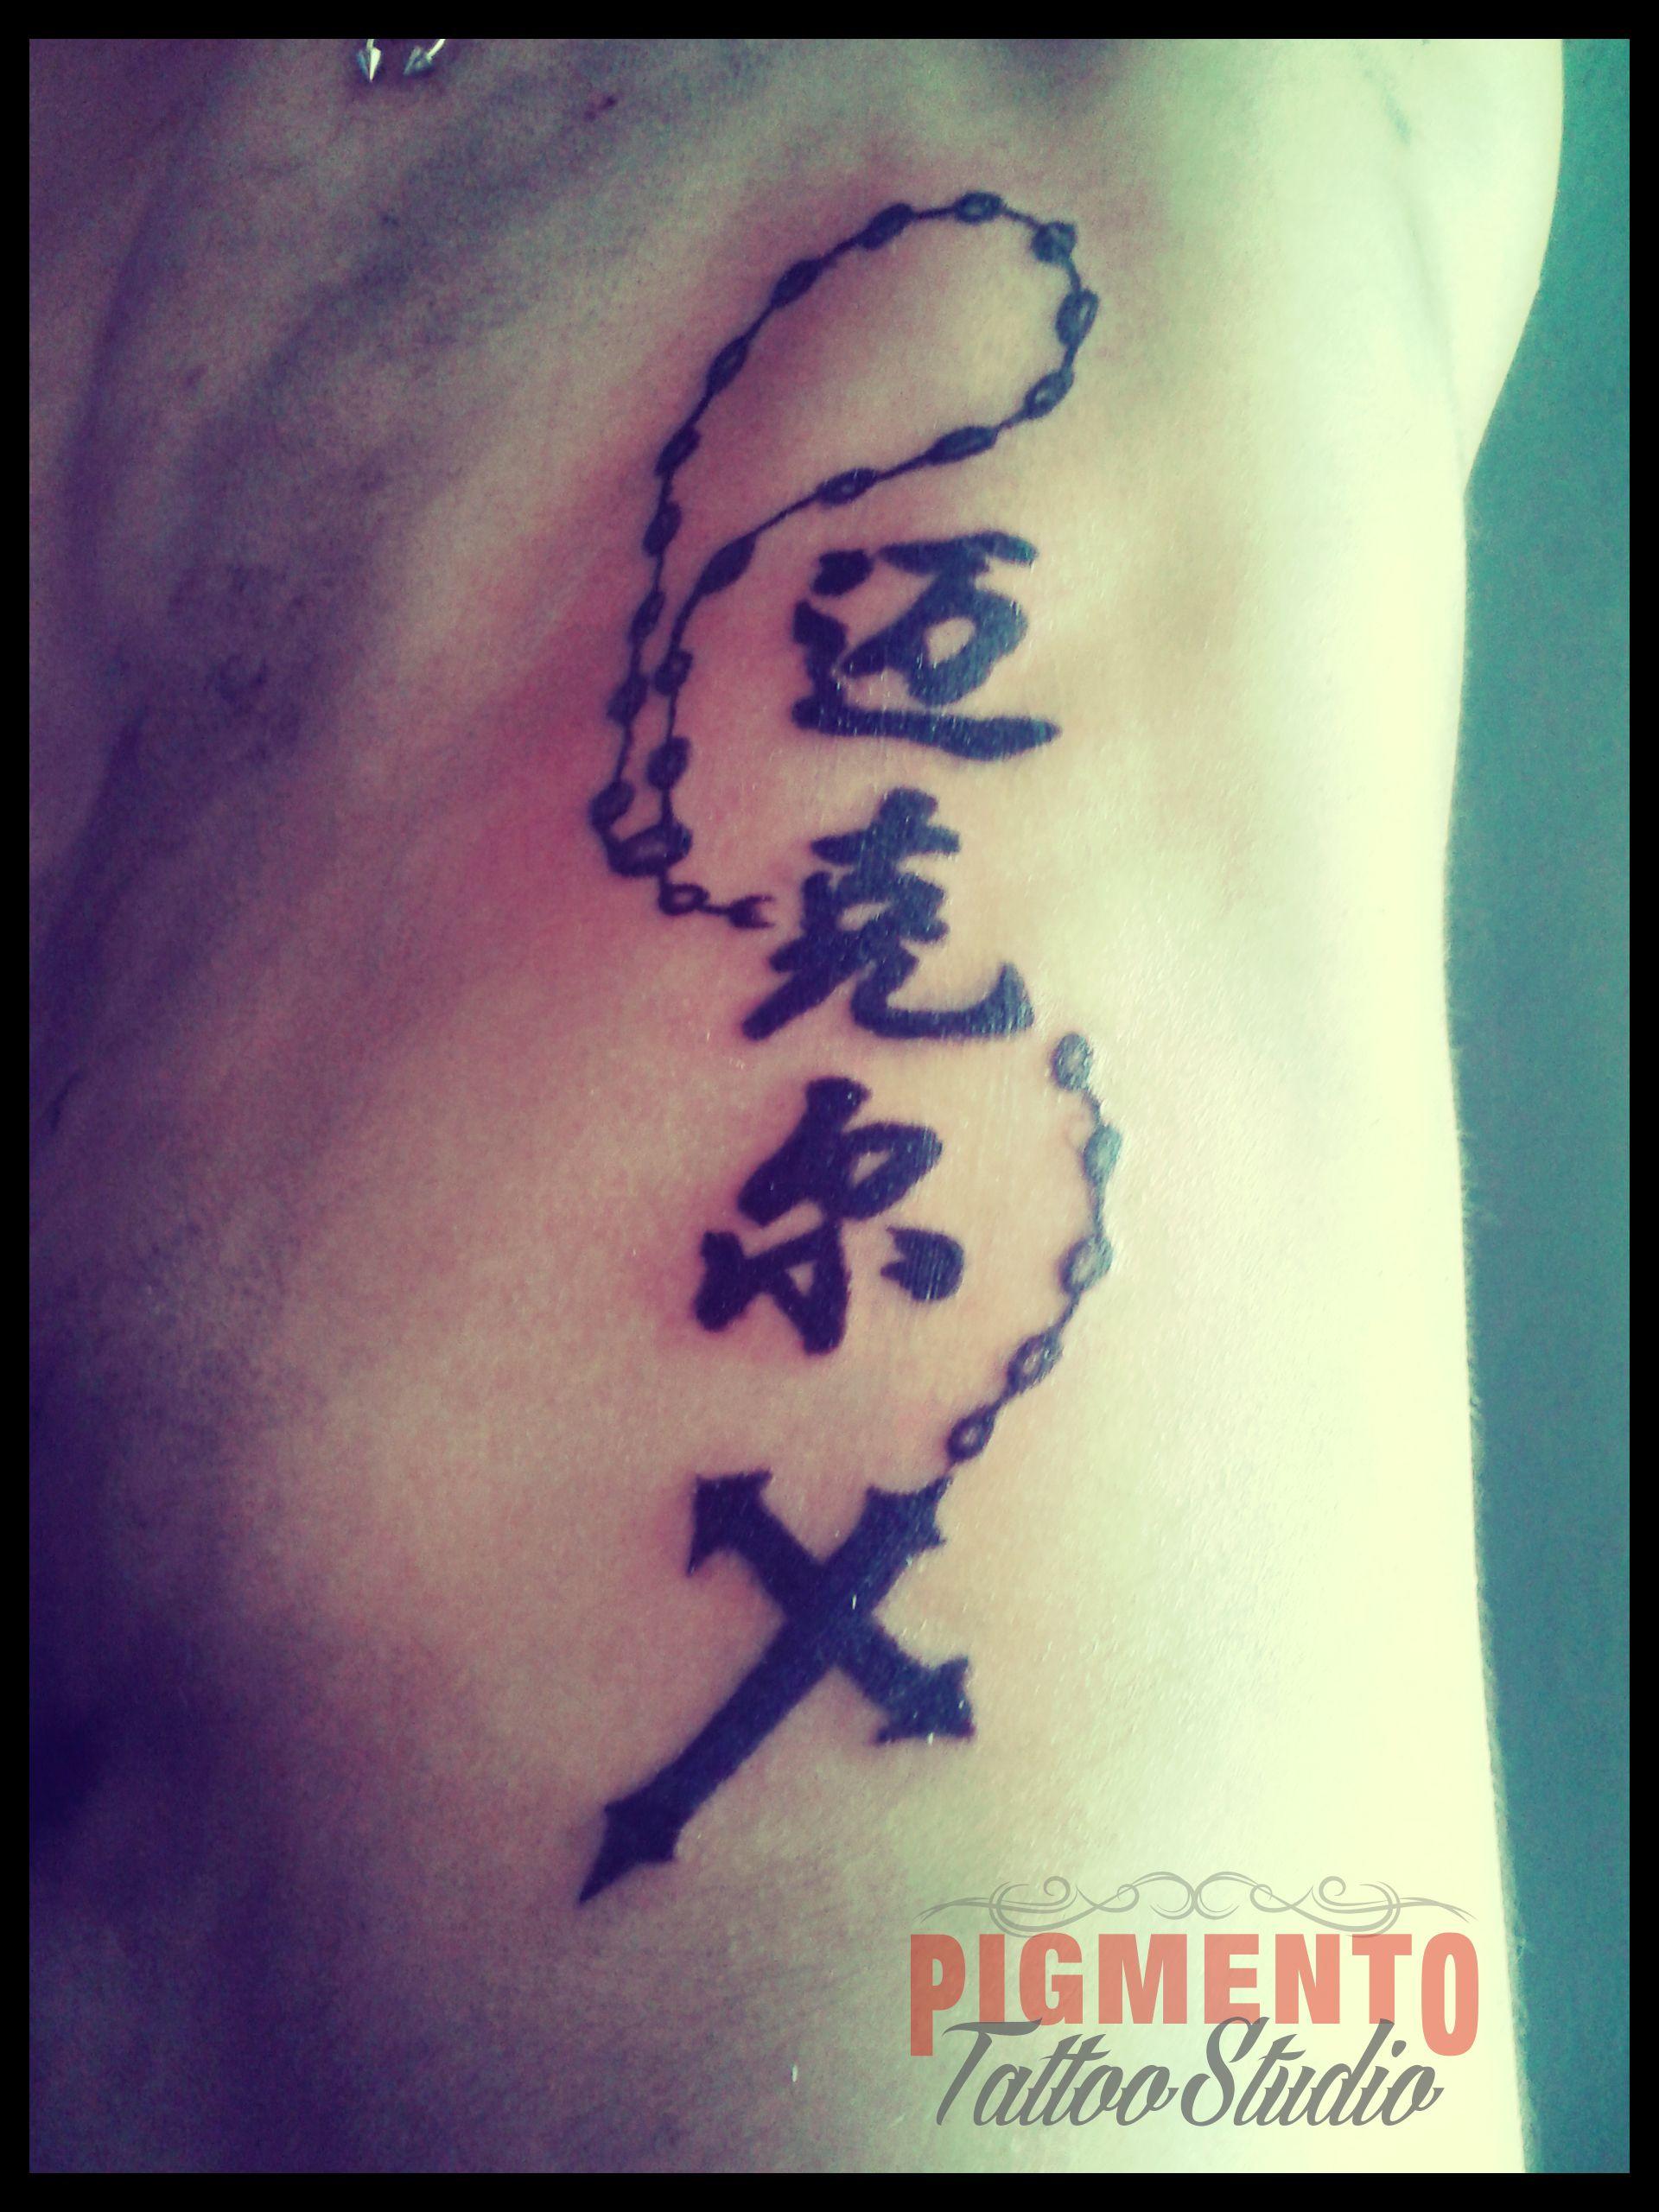 Letras Chinas Terminado Michael Ink Tattoos Pigmentostudio